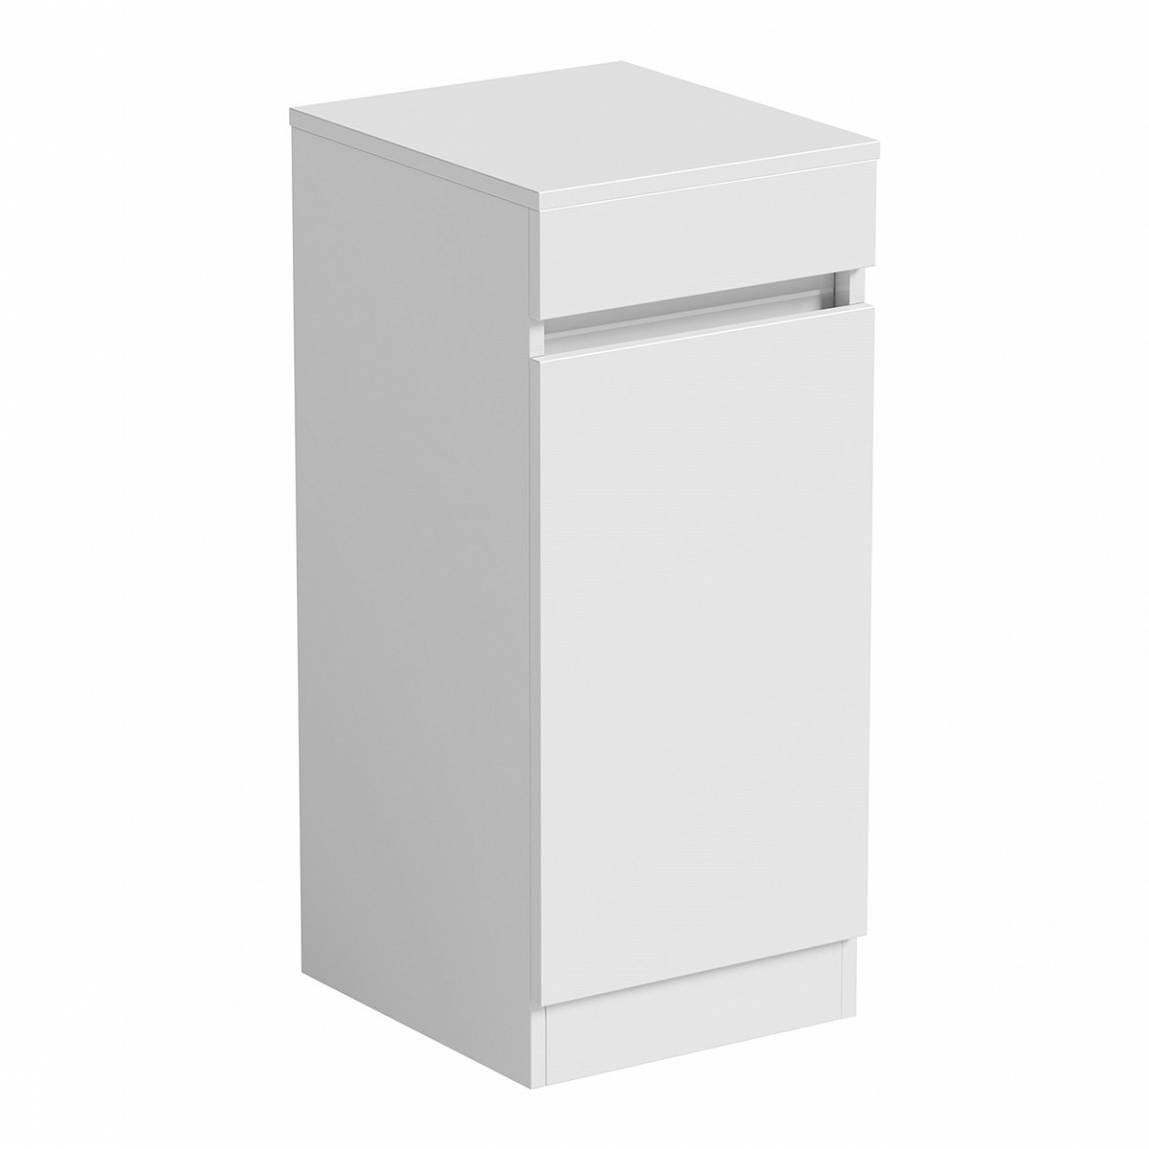 Image of Plan White Storage Unit